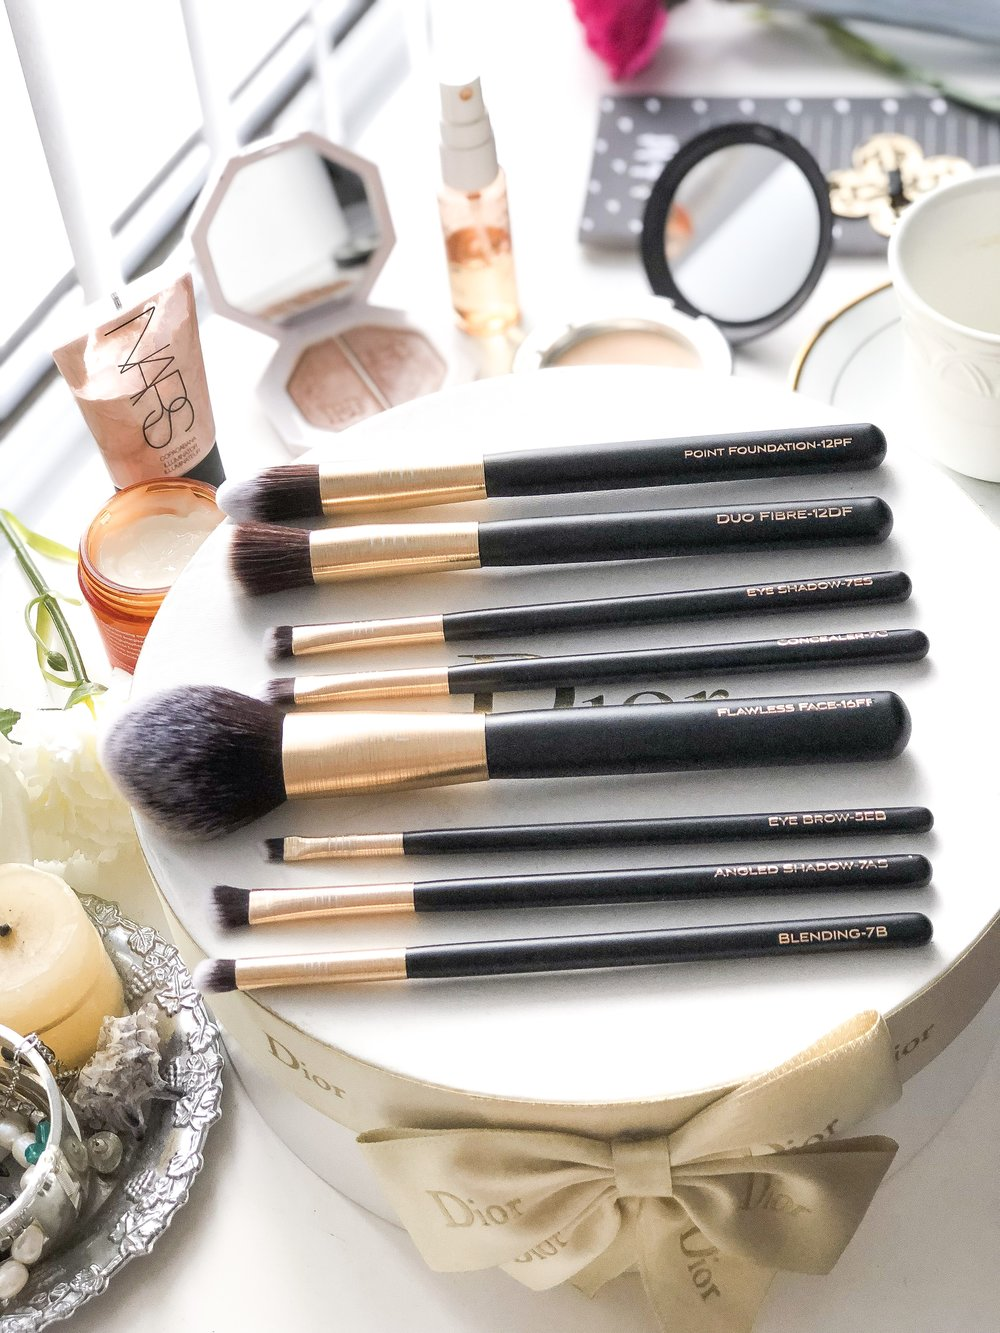 Australian Masey Cosmetics makeup brushes review